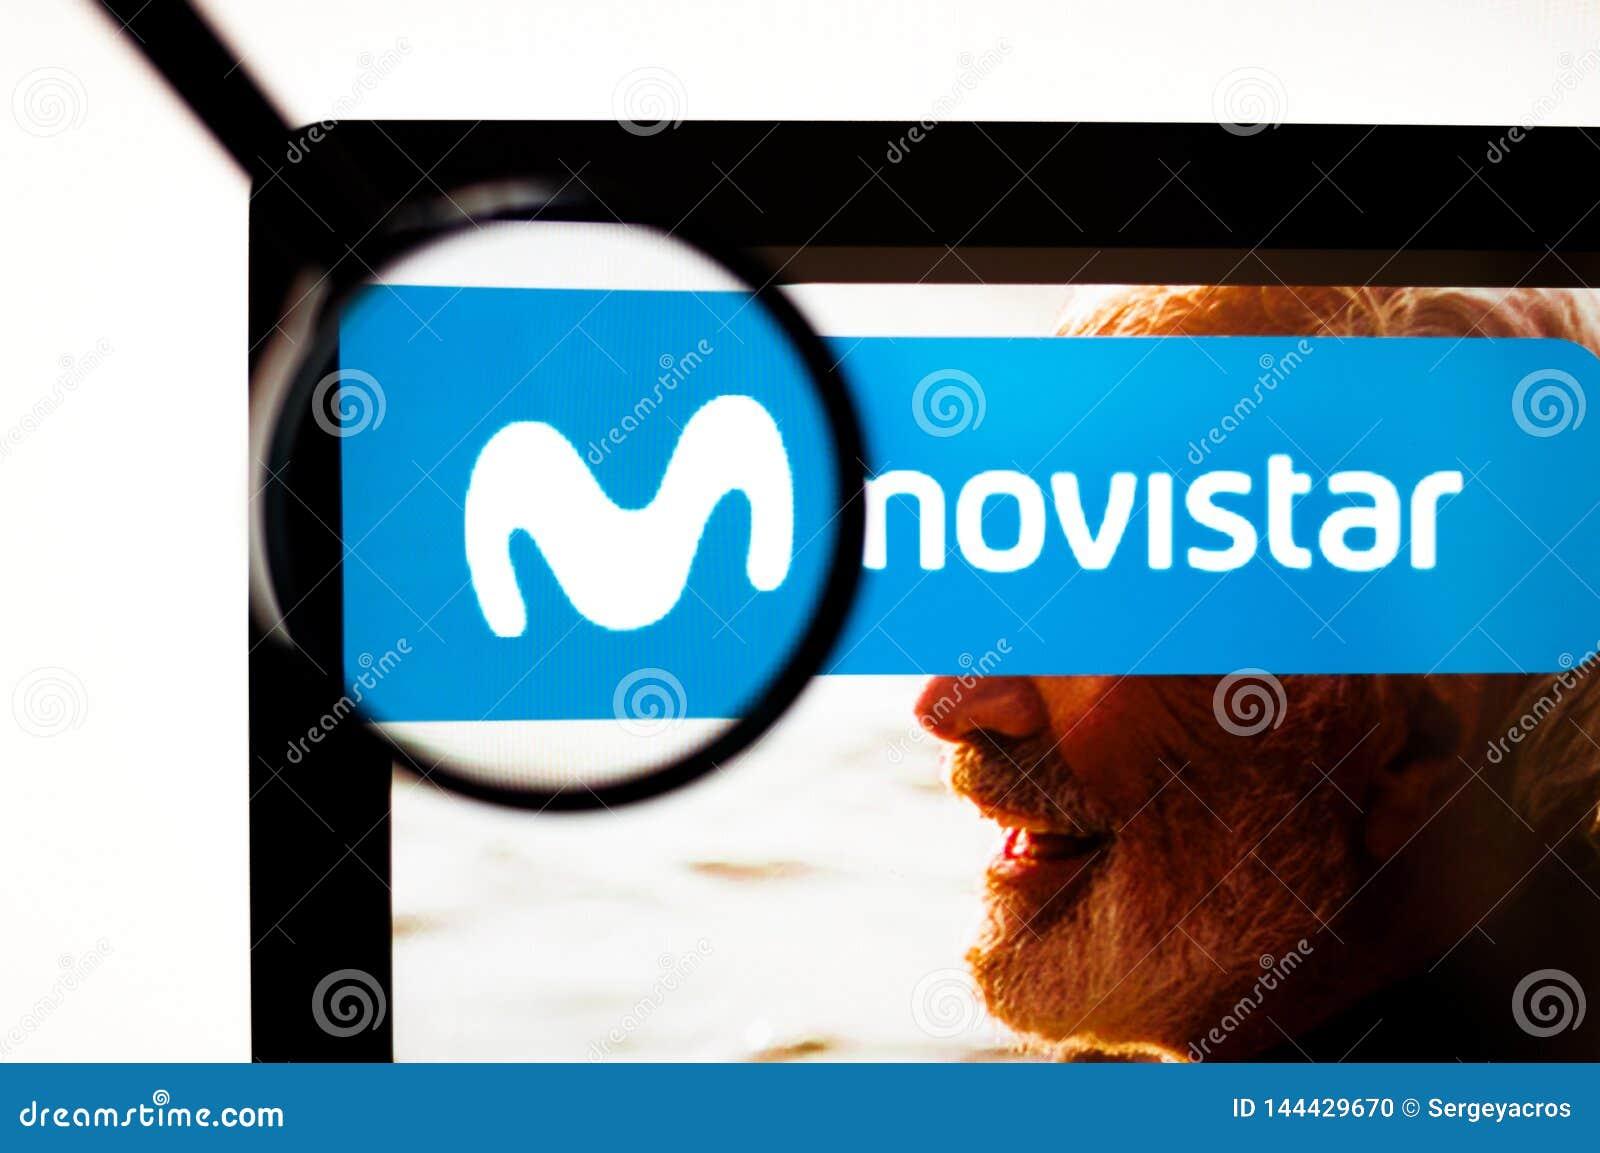 Kiev, Ukraine - april 6, 2019: Movistar logo visible